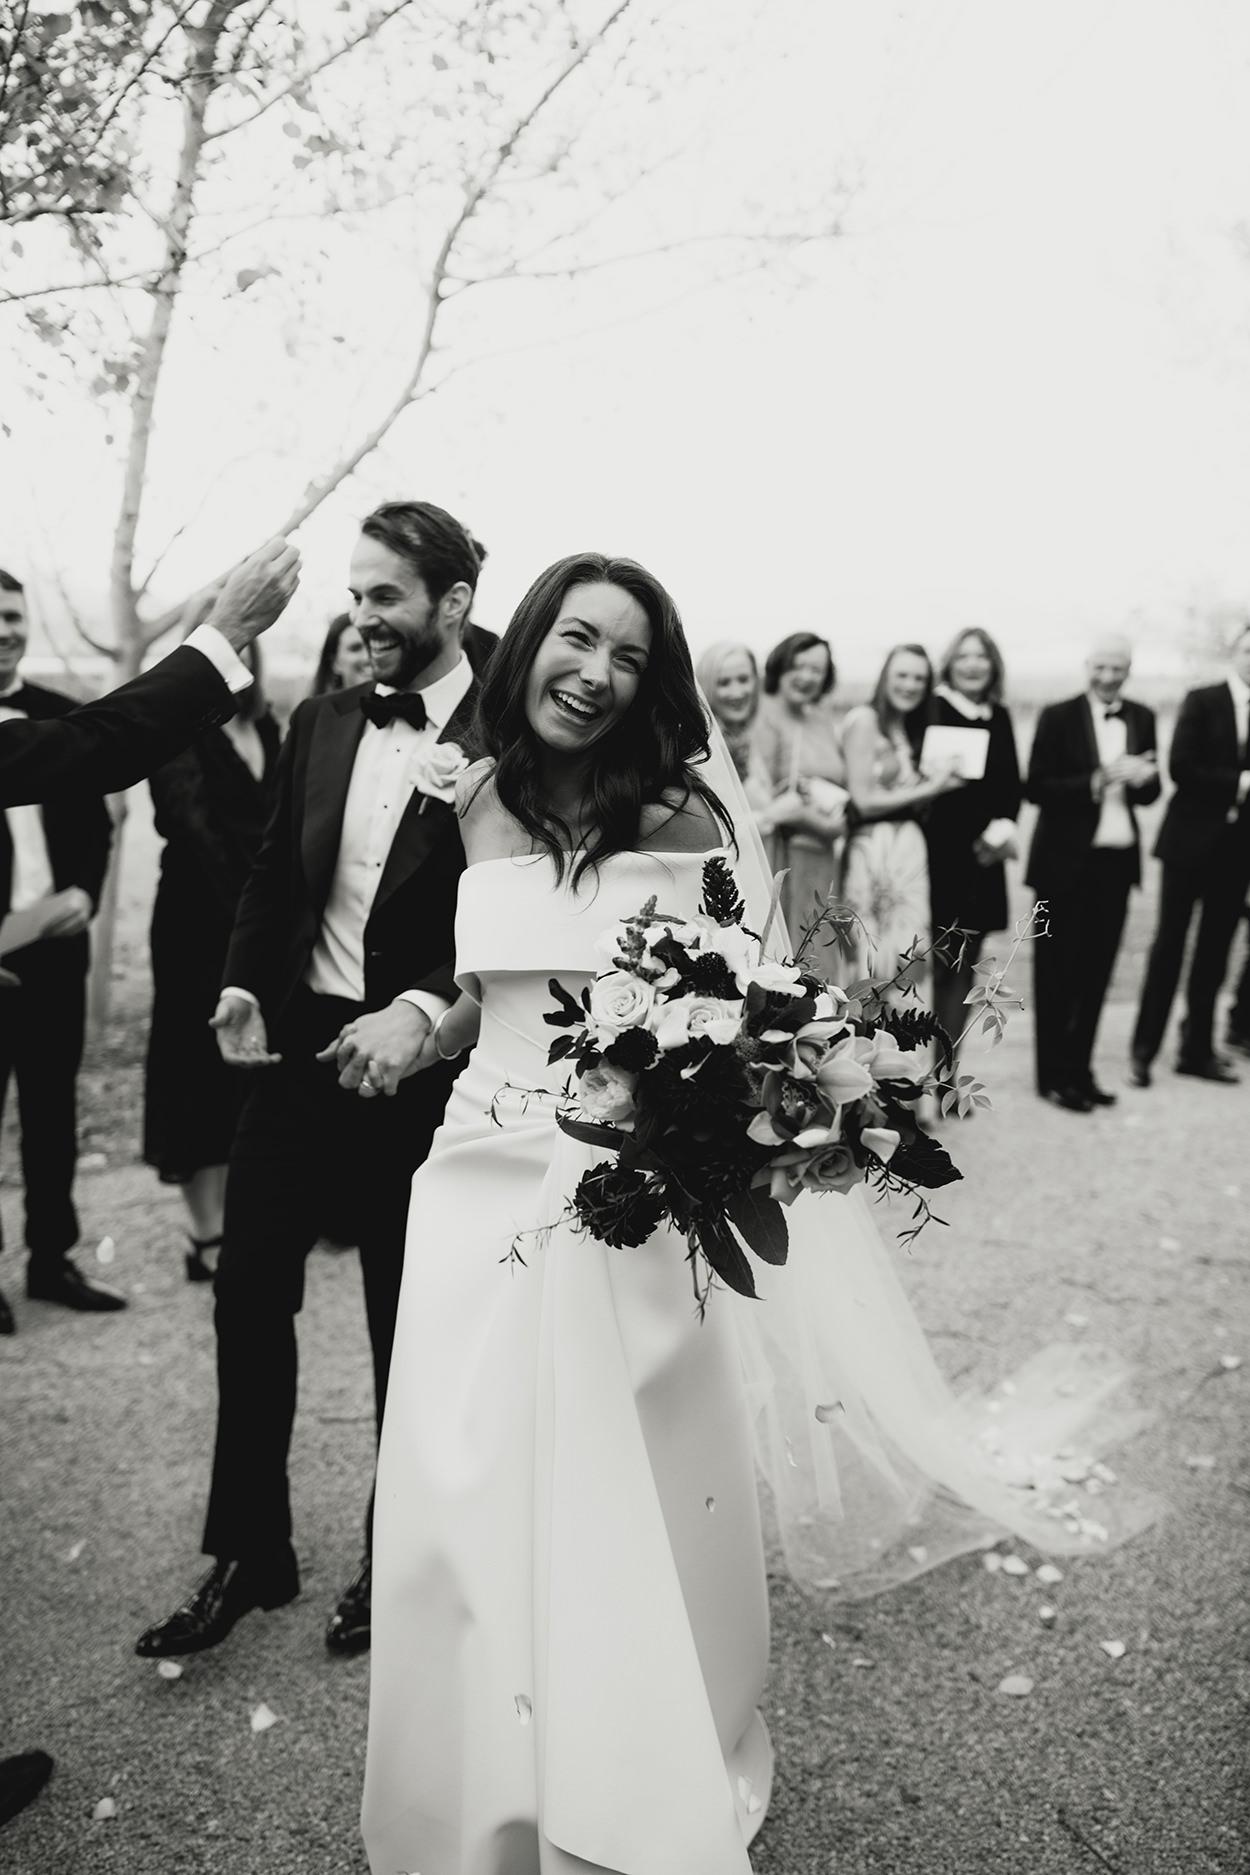 I-Got-You-Babe-Weddings-Olivia-and-Ben-Stones-of-the-Yarra-Valley-Wedding0372.jpg